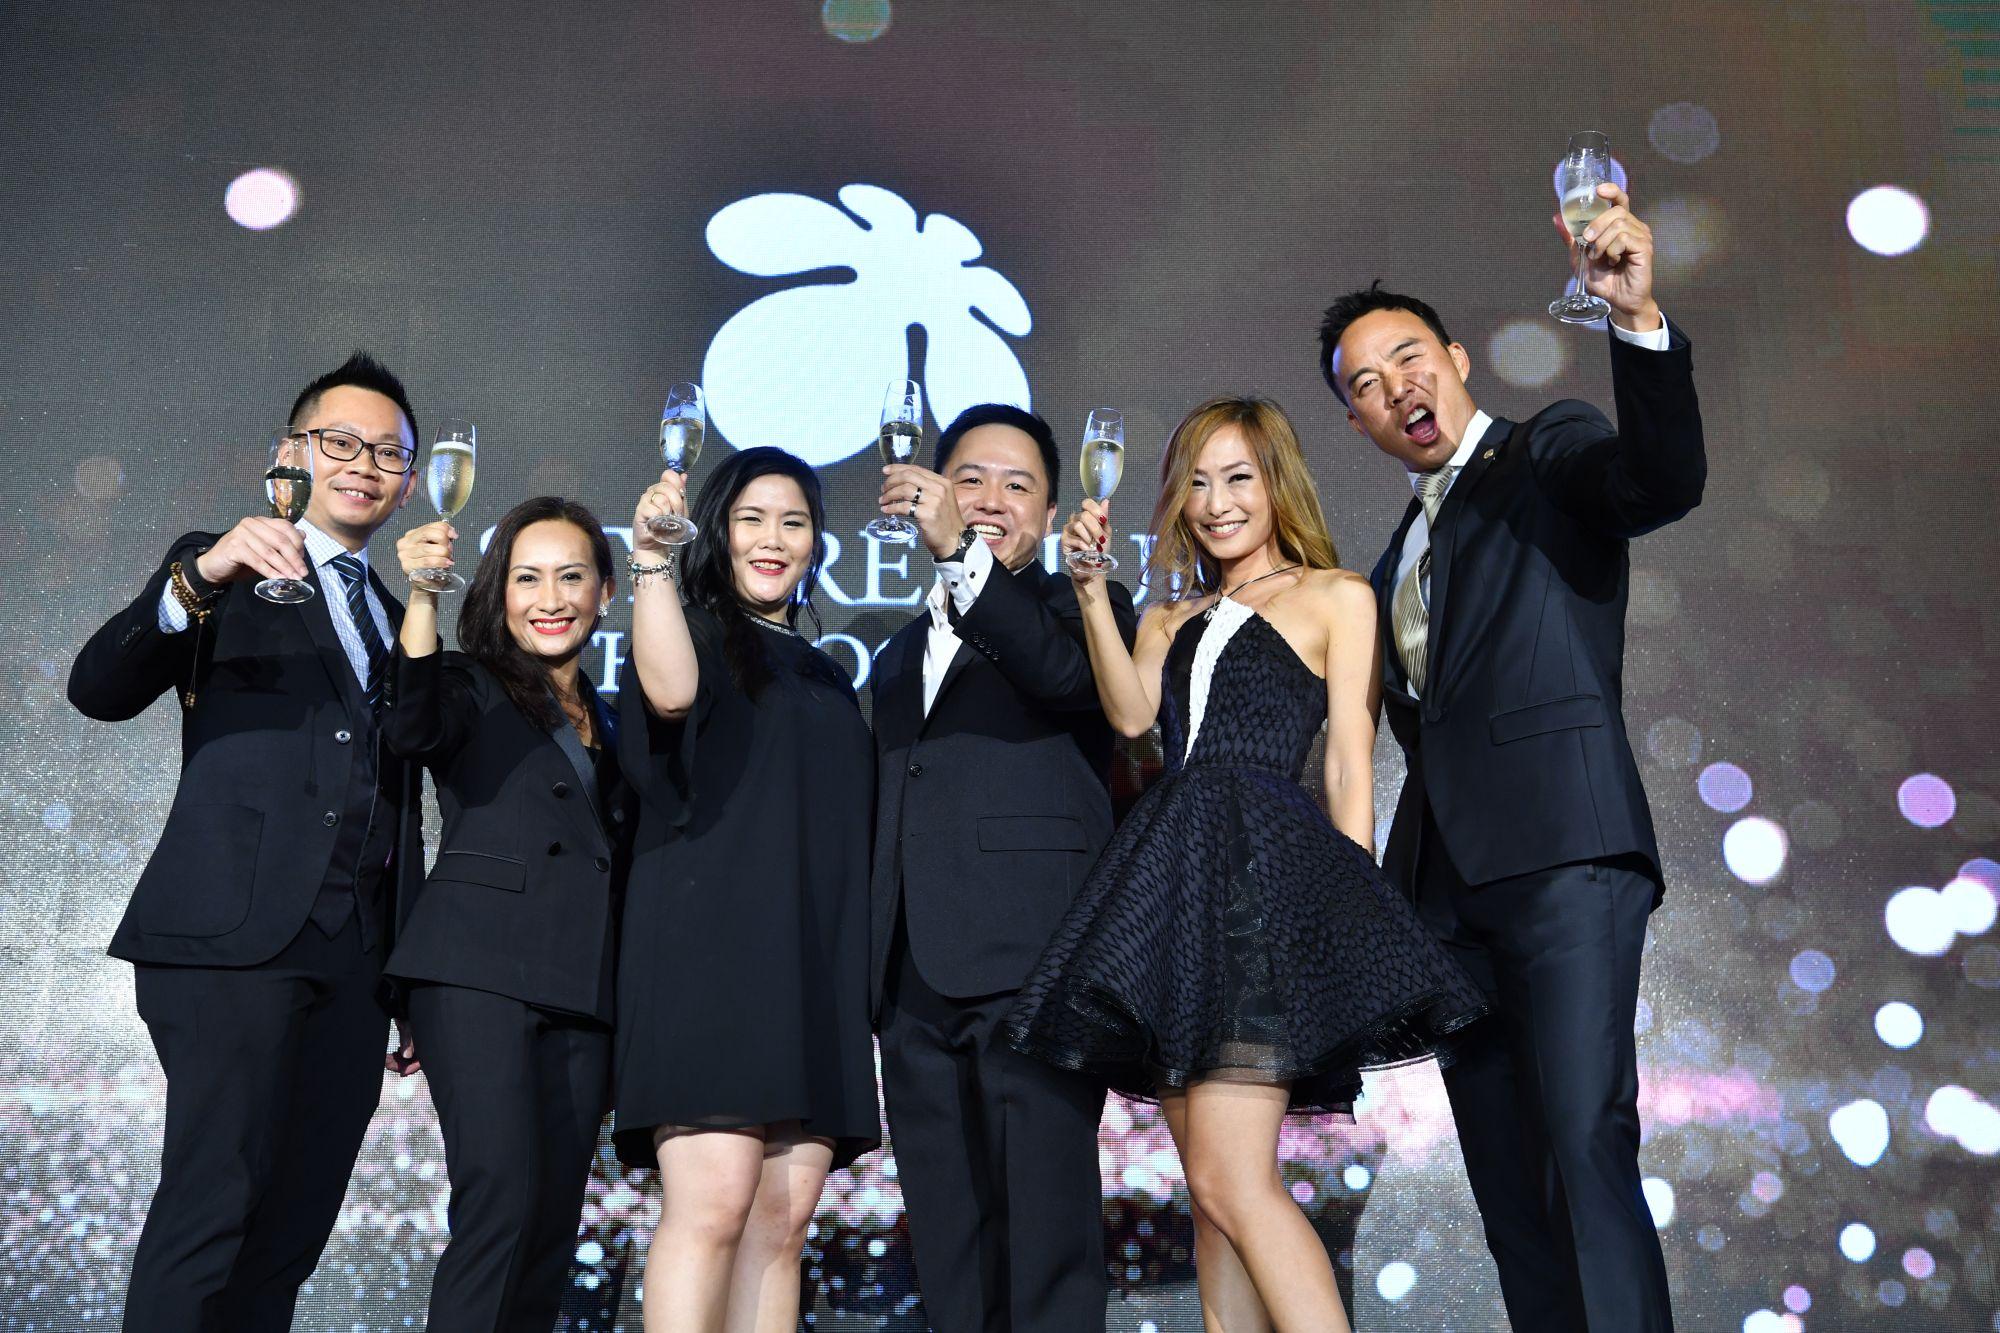 Alvin Tan, Barbara Gonzales, Lily Han, Andy Low, Tan Min-Li, Allan Wu